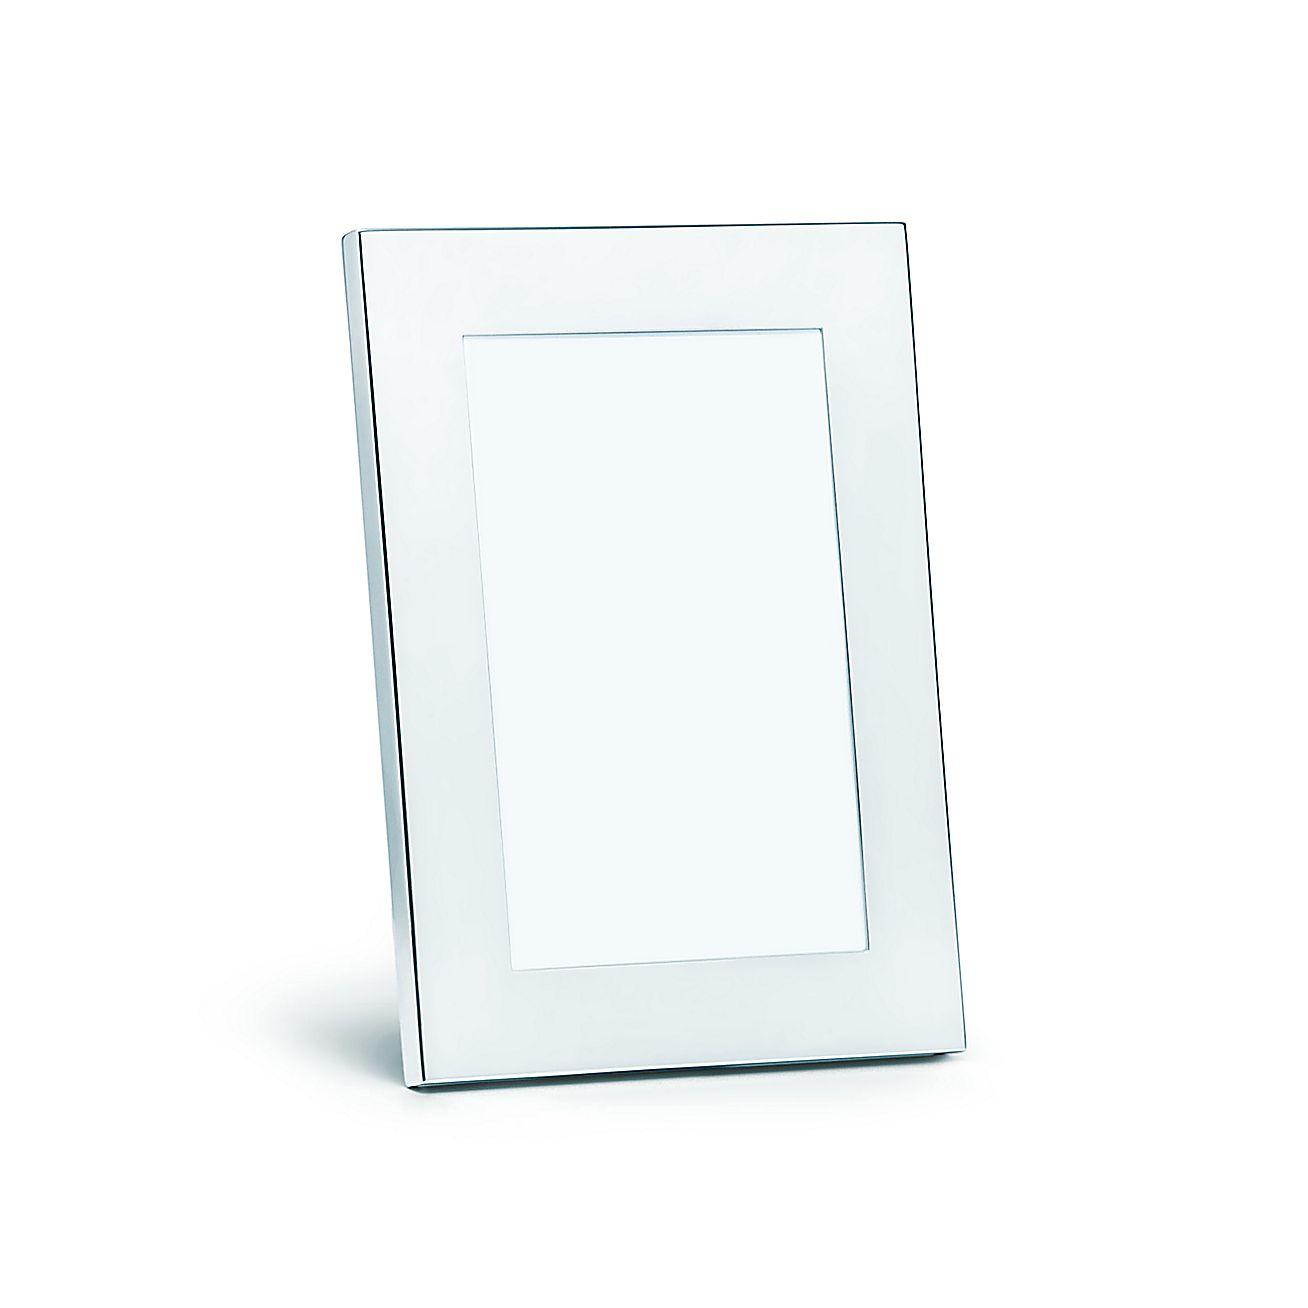 Marco rectangular en plata esterlina. | Tiffany & Co.